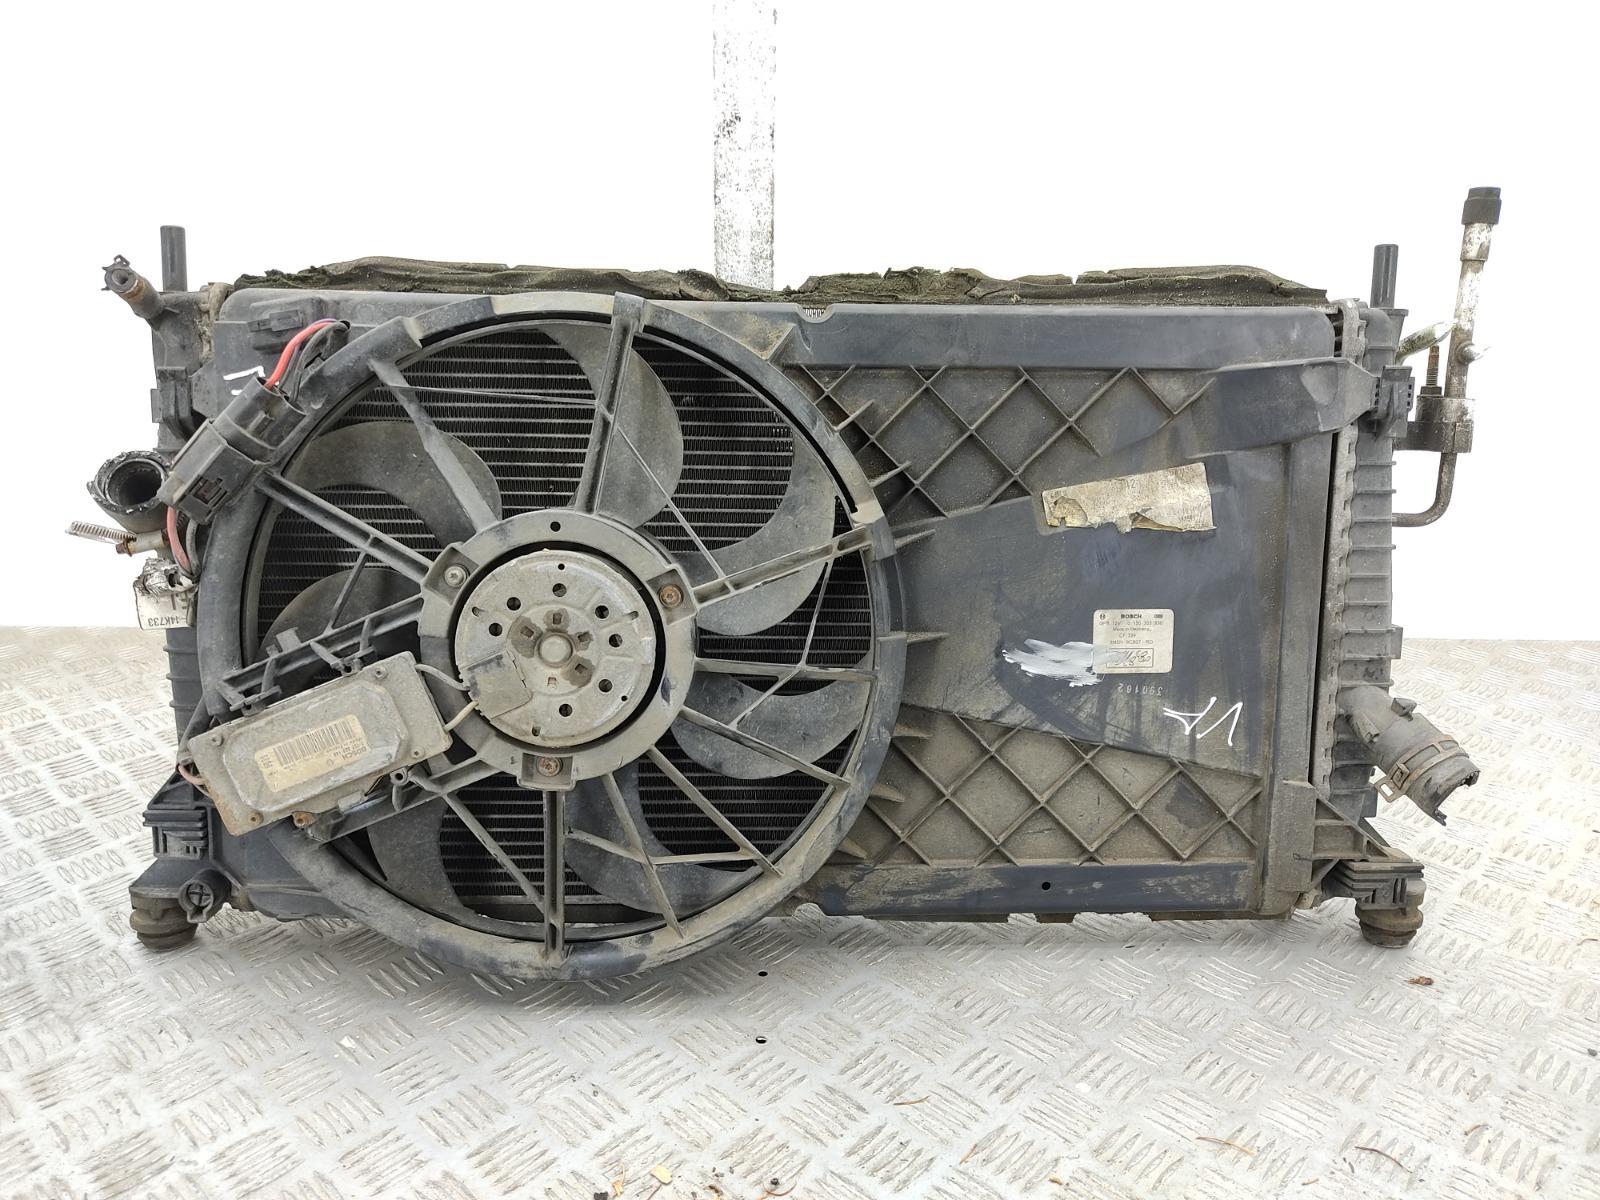 Кассета радиаторов Ford C-Max 1.8 I 2003 (б/у)